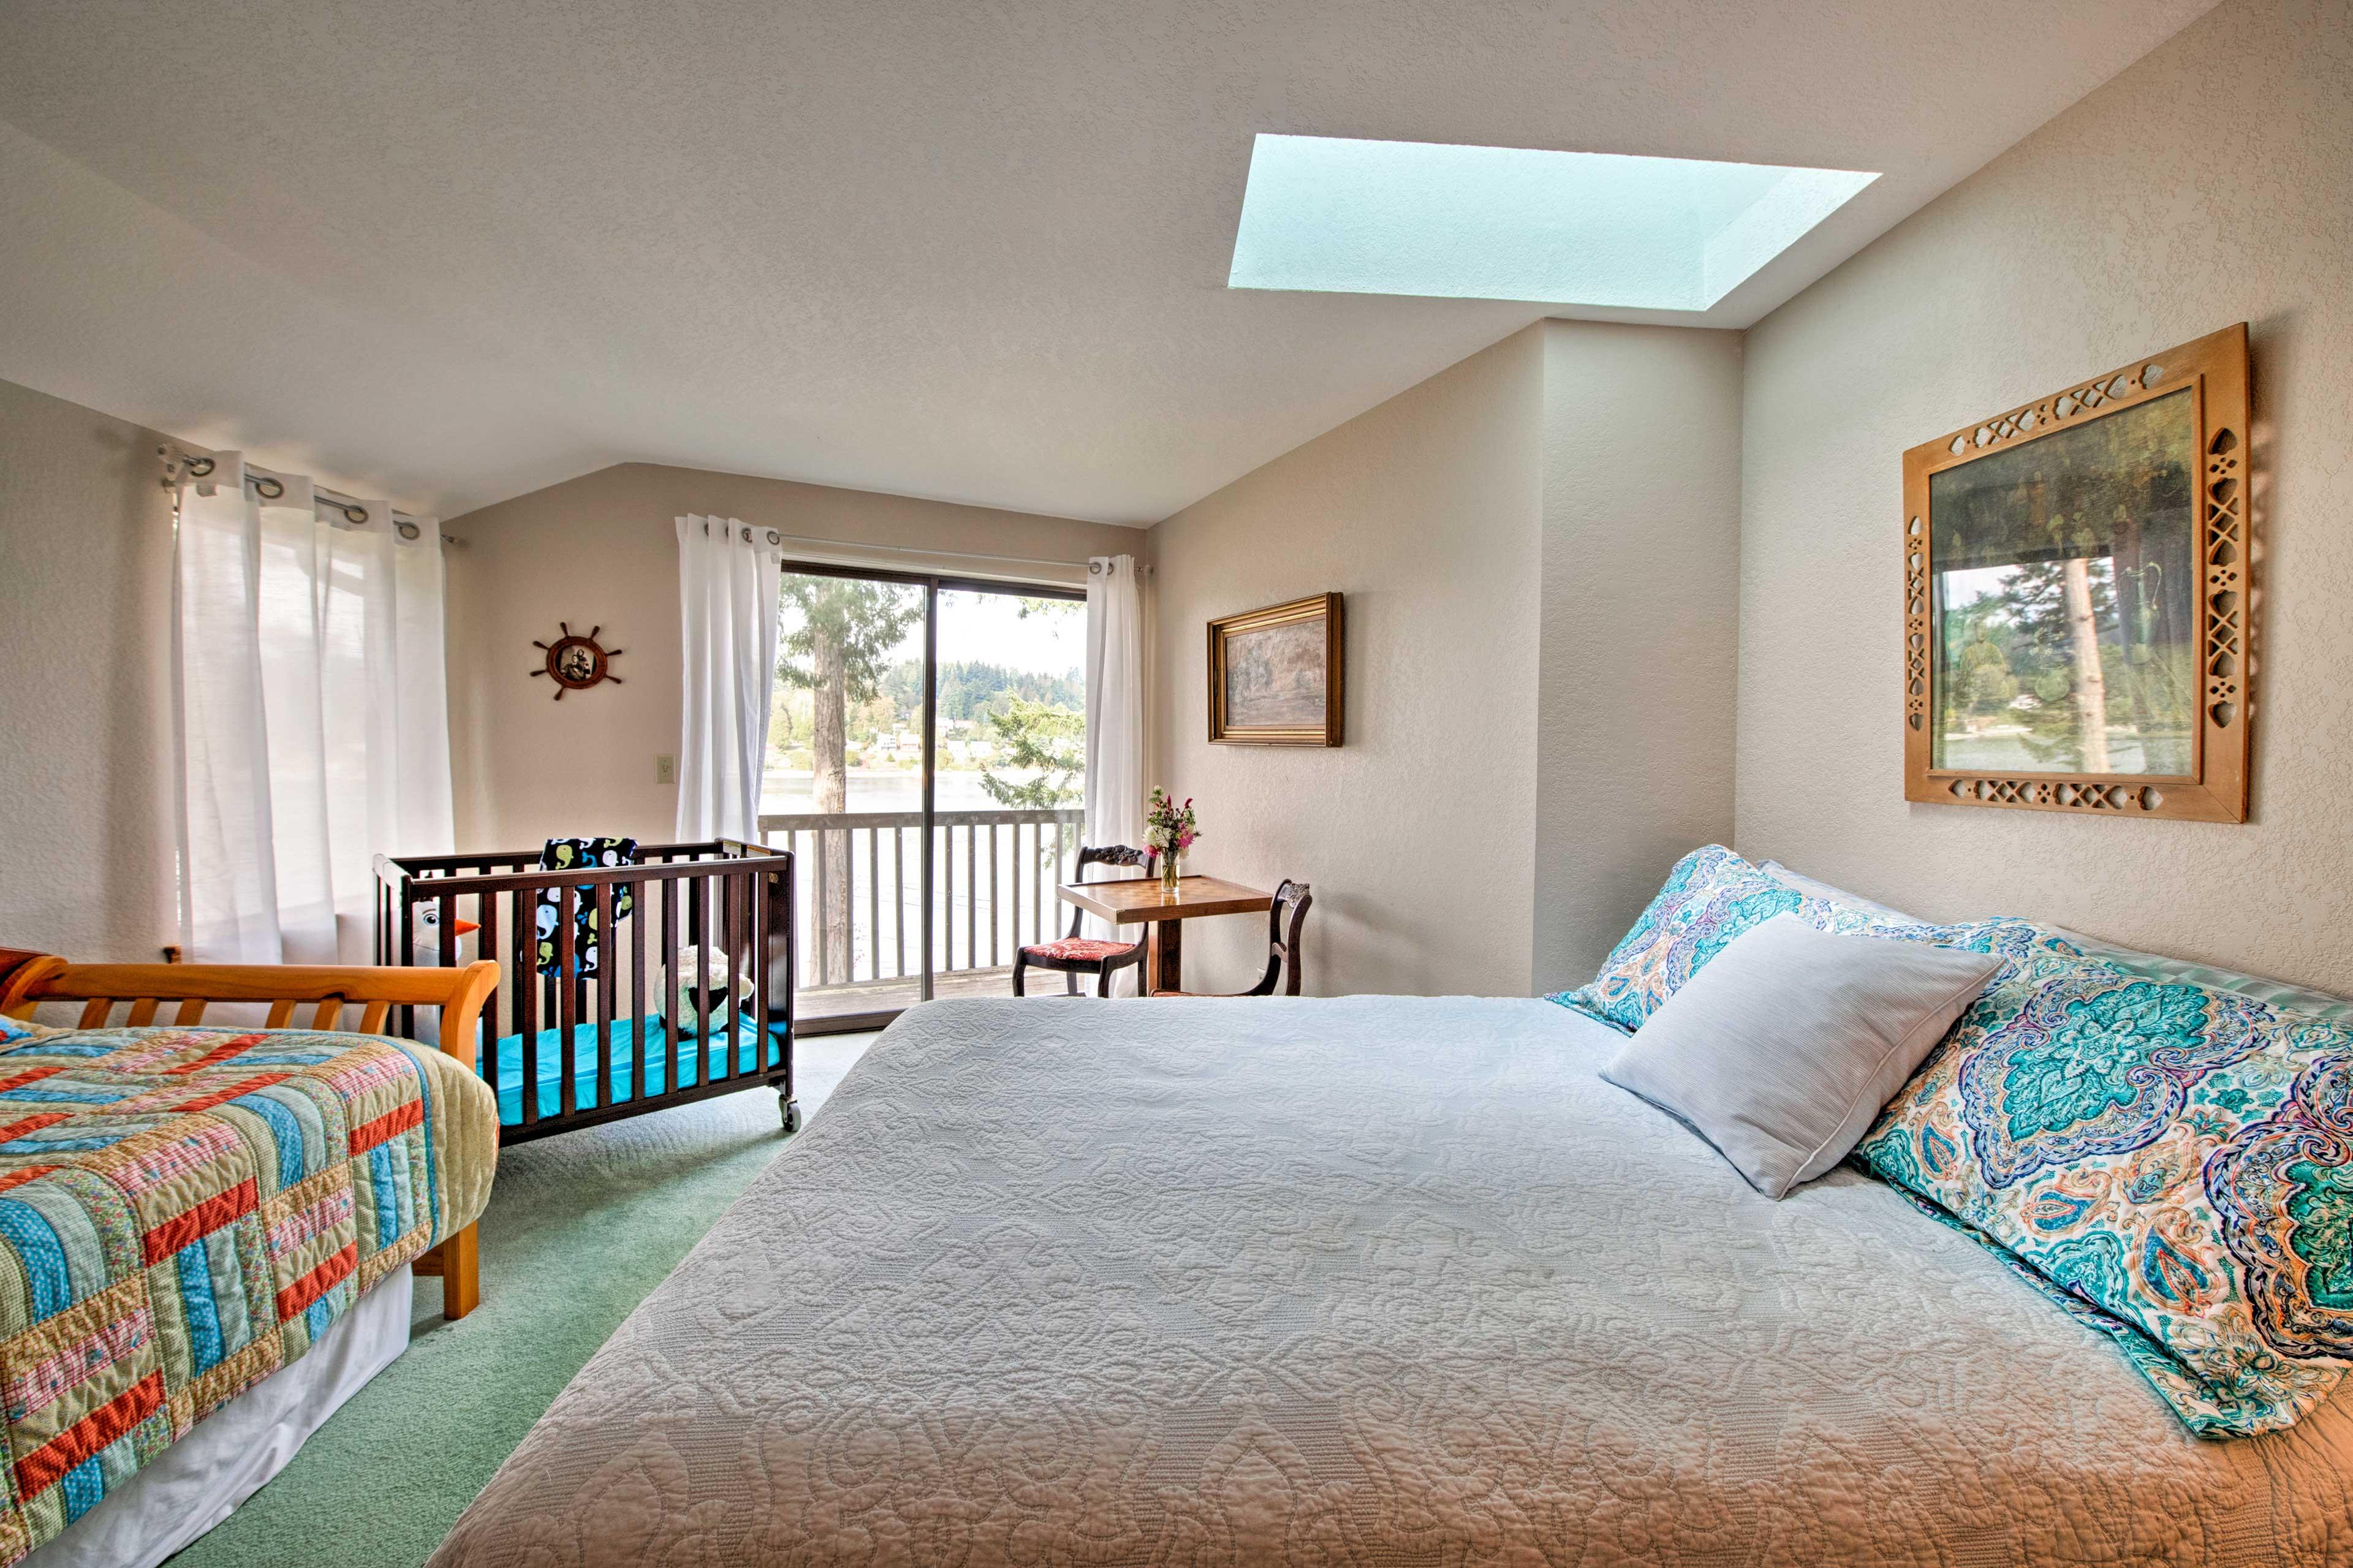 Bedroom 2 | 2nd Floor | Queen Bed | Twin Day Bed | Additional Sleeping: Crib